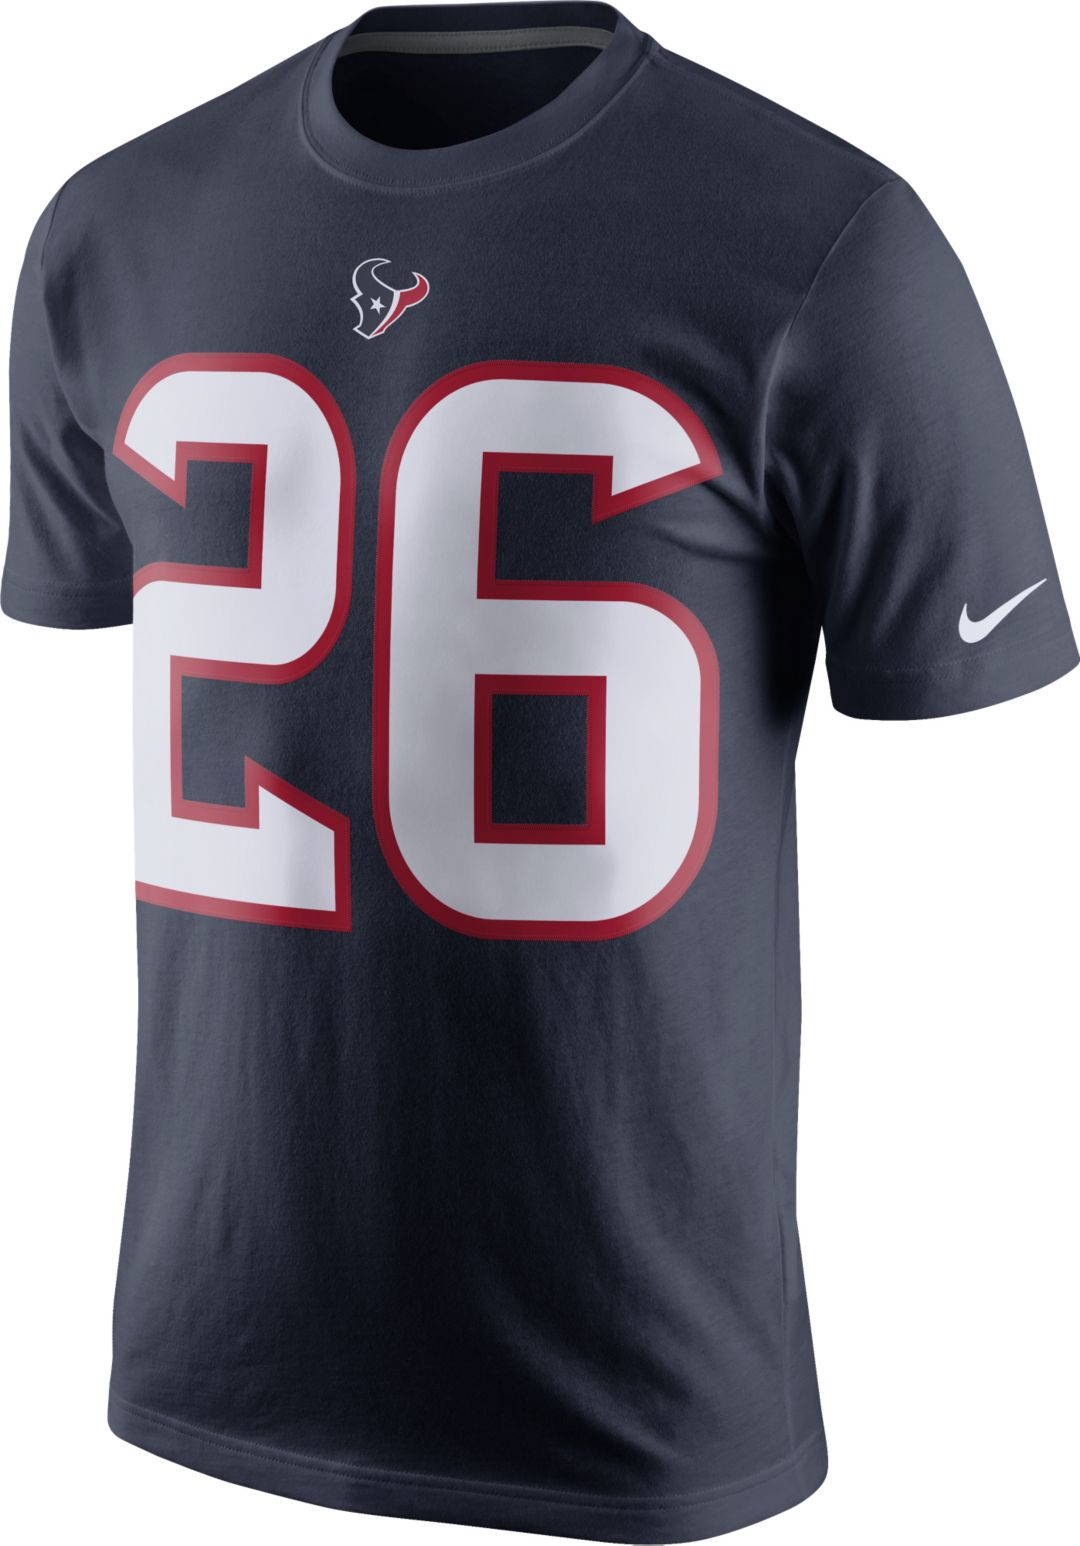 check out 43208 77dad Nike Men's Houston Texans Lamar Miller #26 Pride Navy T-Shirt